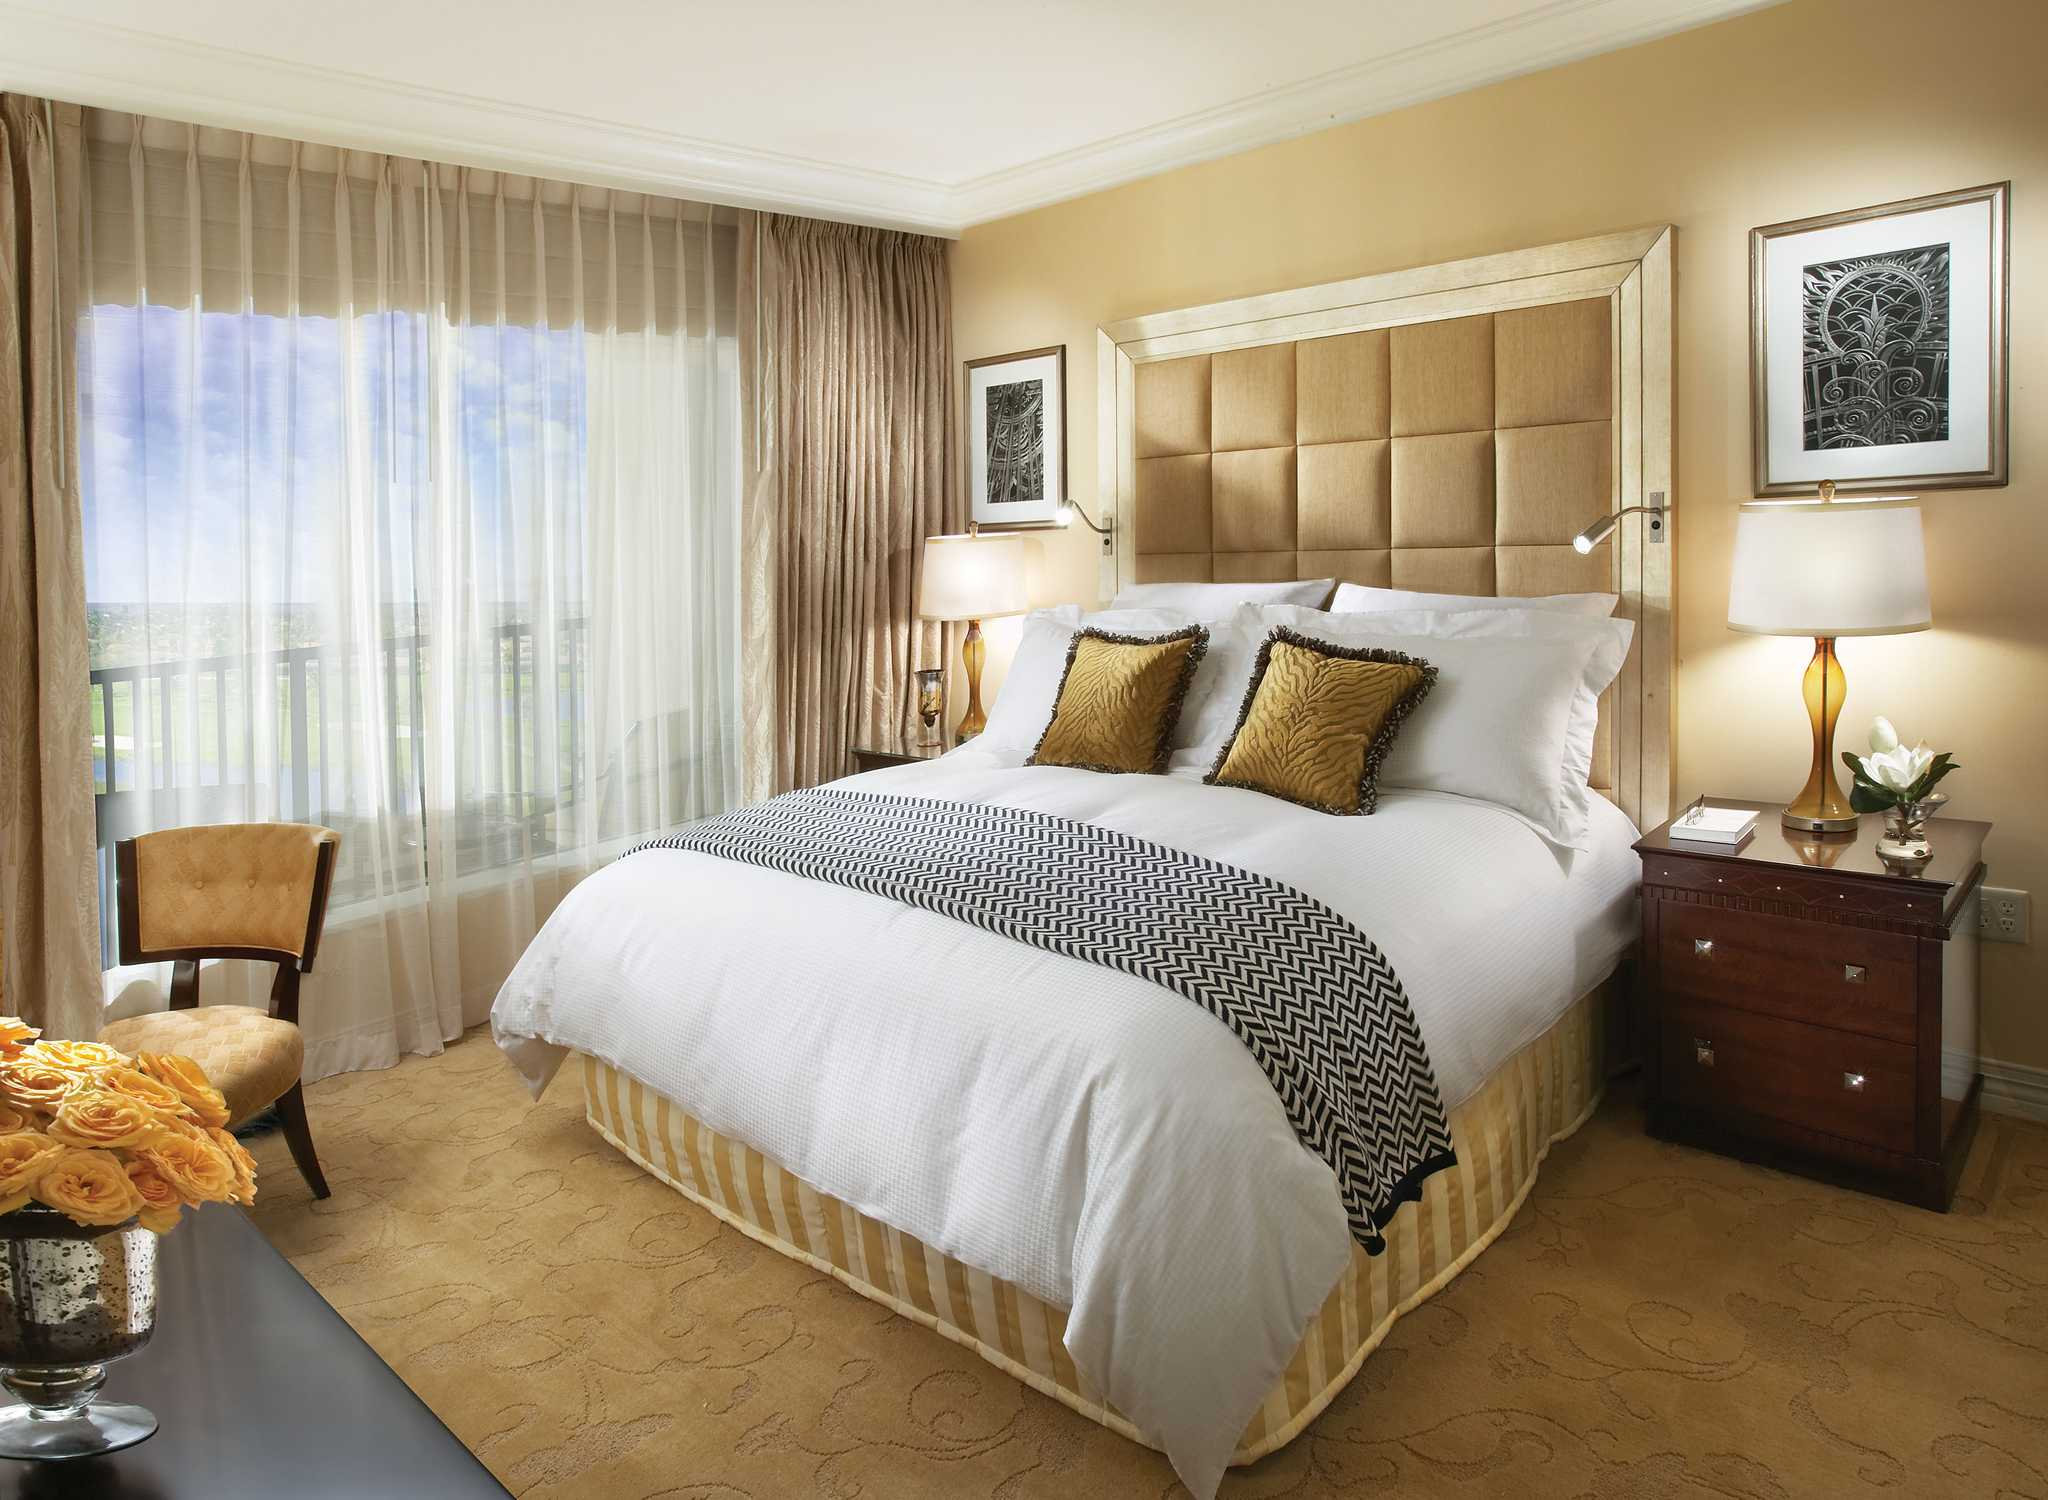 Дизайн кровати по фэн-шуй